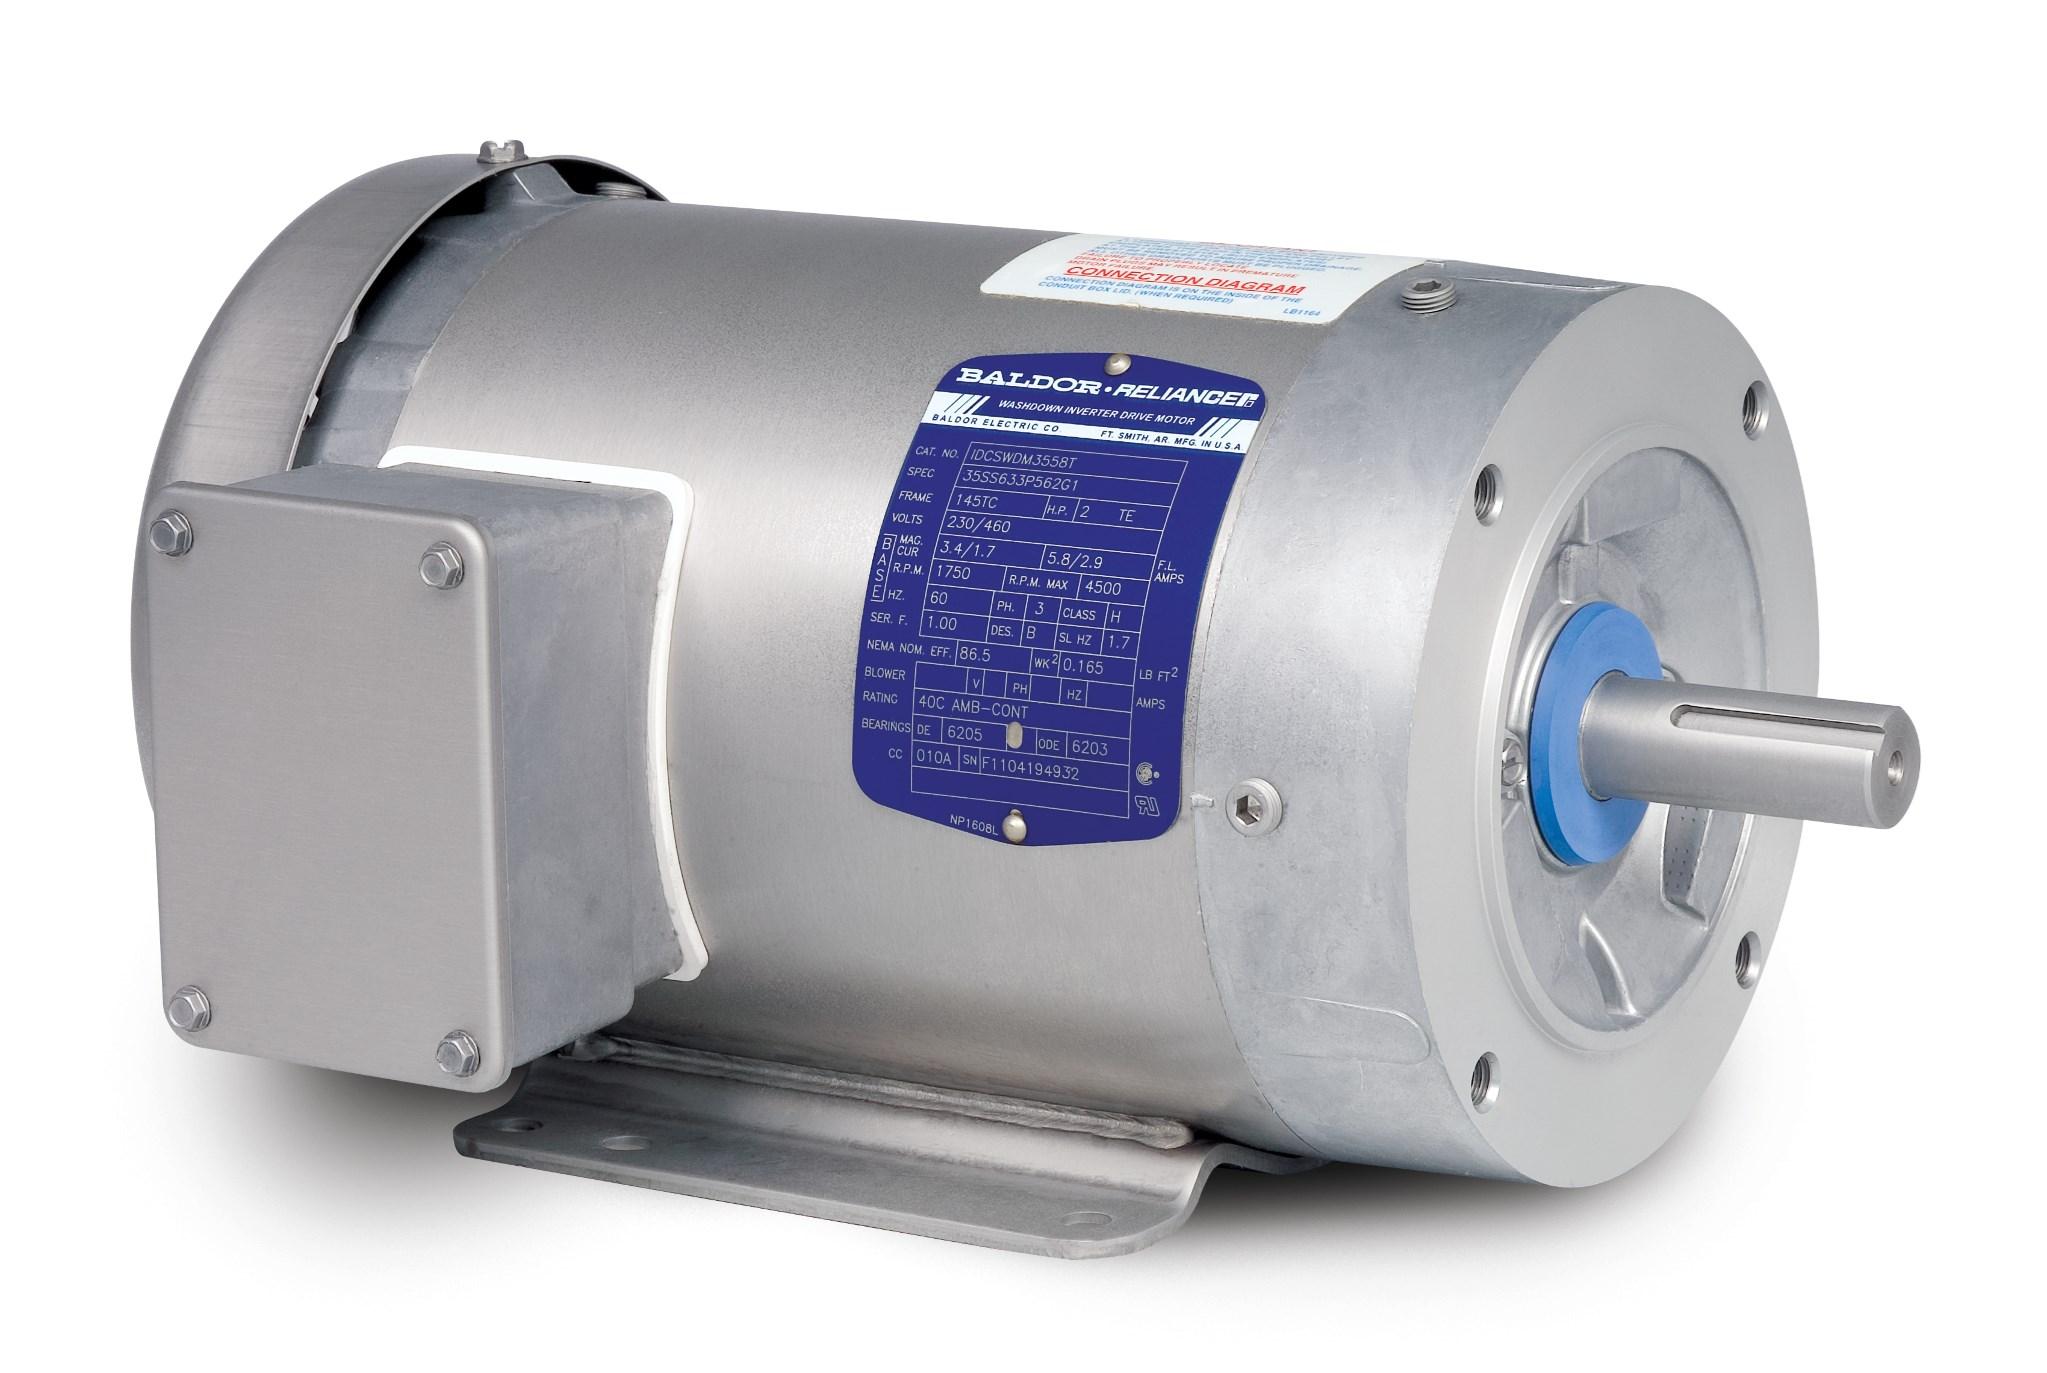 washdown duty baldor com rh baldor com baldor vfd drive Fdl3612tm Baldor Capacitor Wiring Diagram